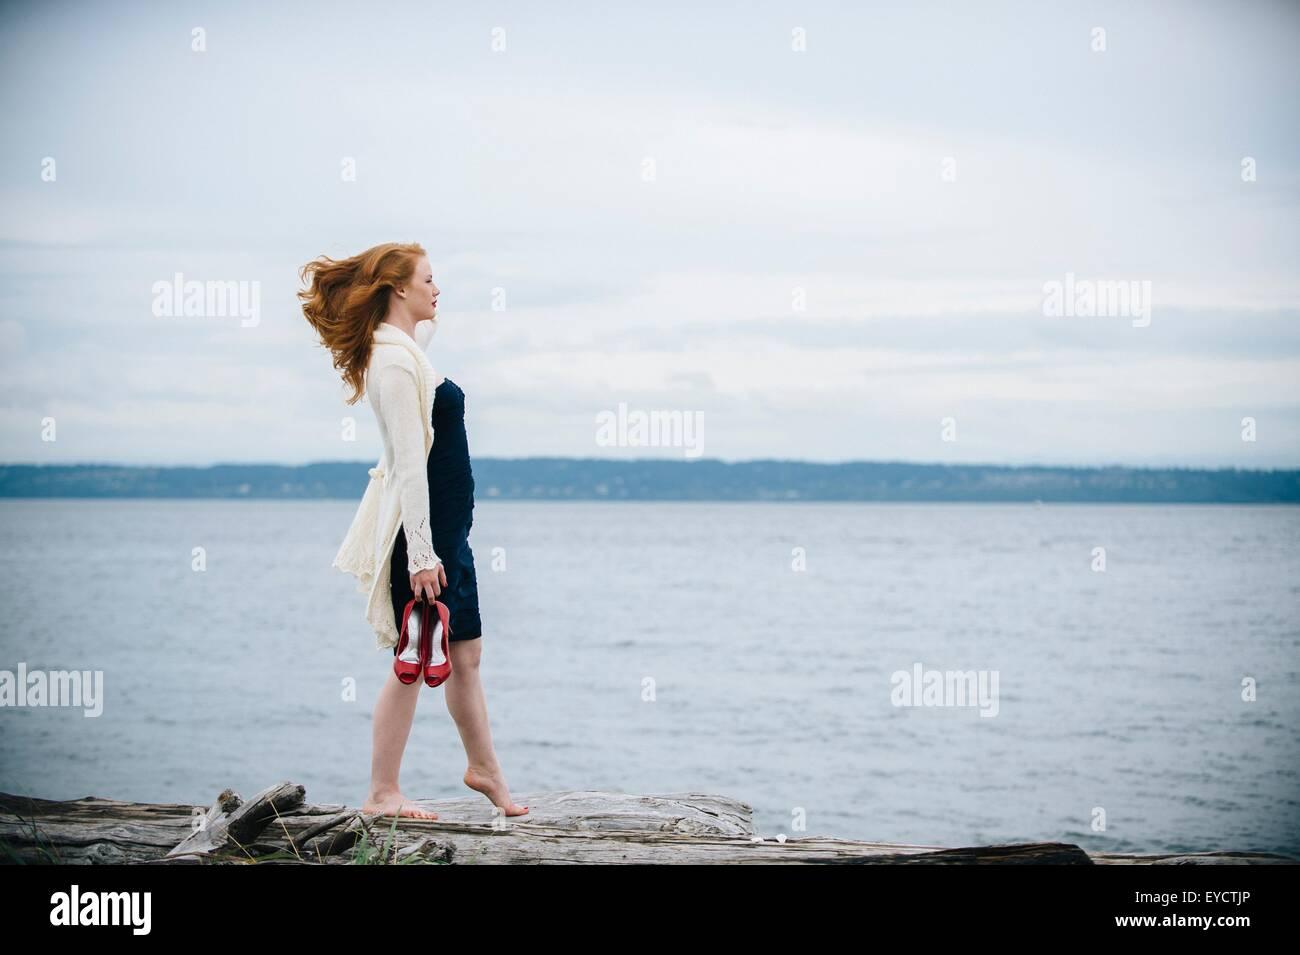 Young woman on beach looking out to sea, Bainbridge Island, Washington State, USA - Stock Image